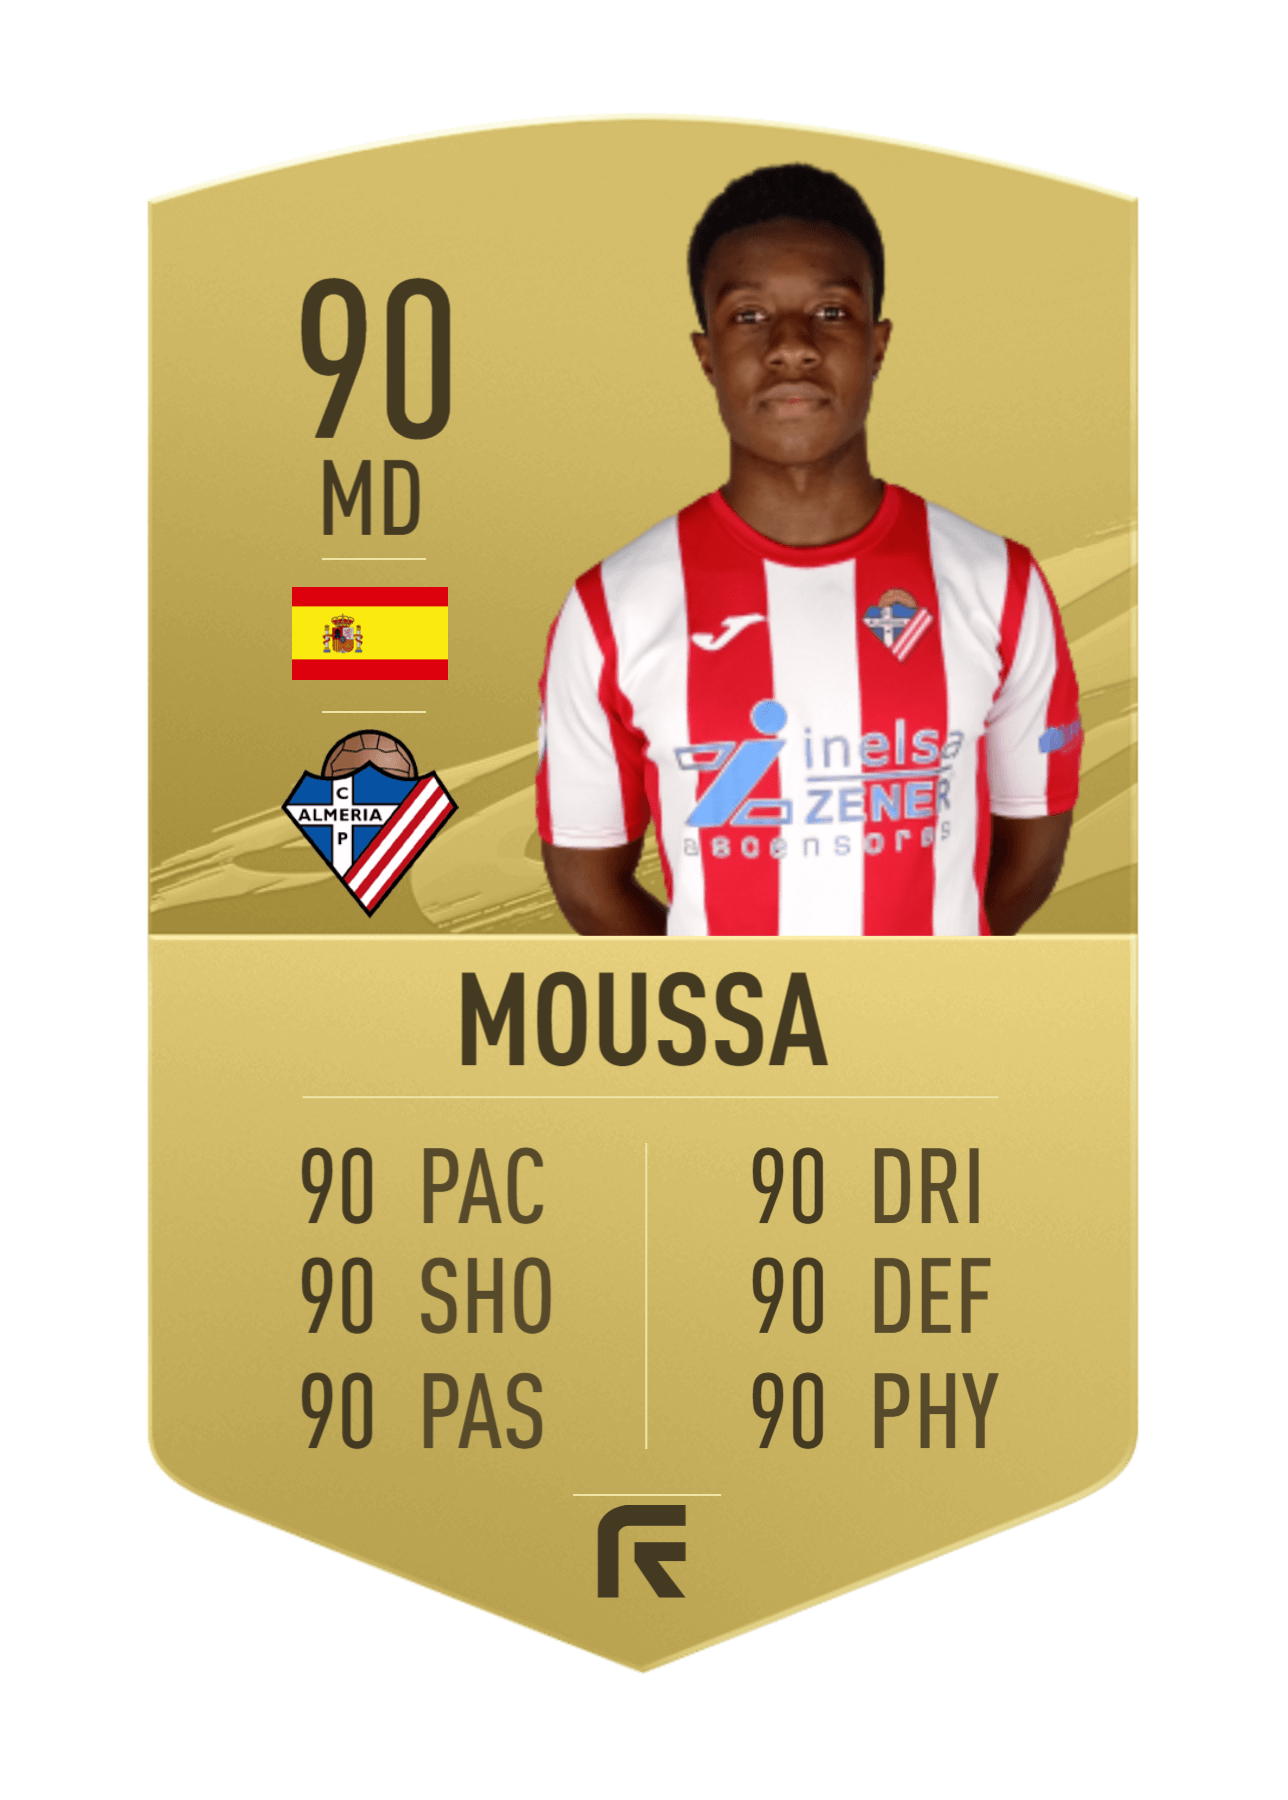 Moussa_cromo